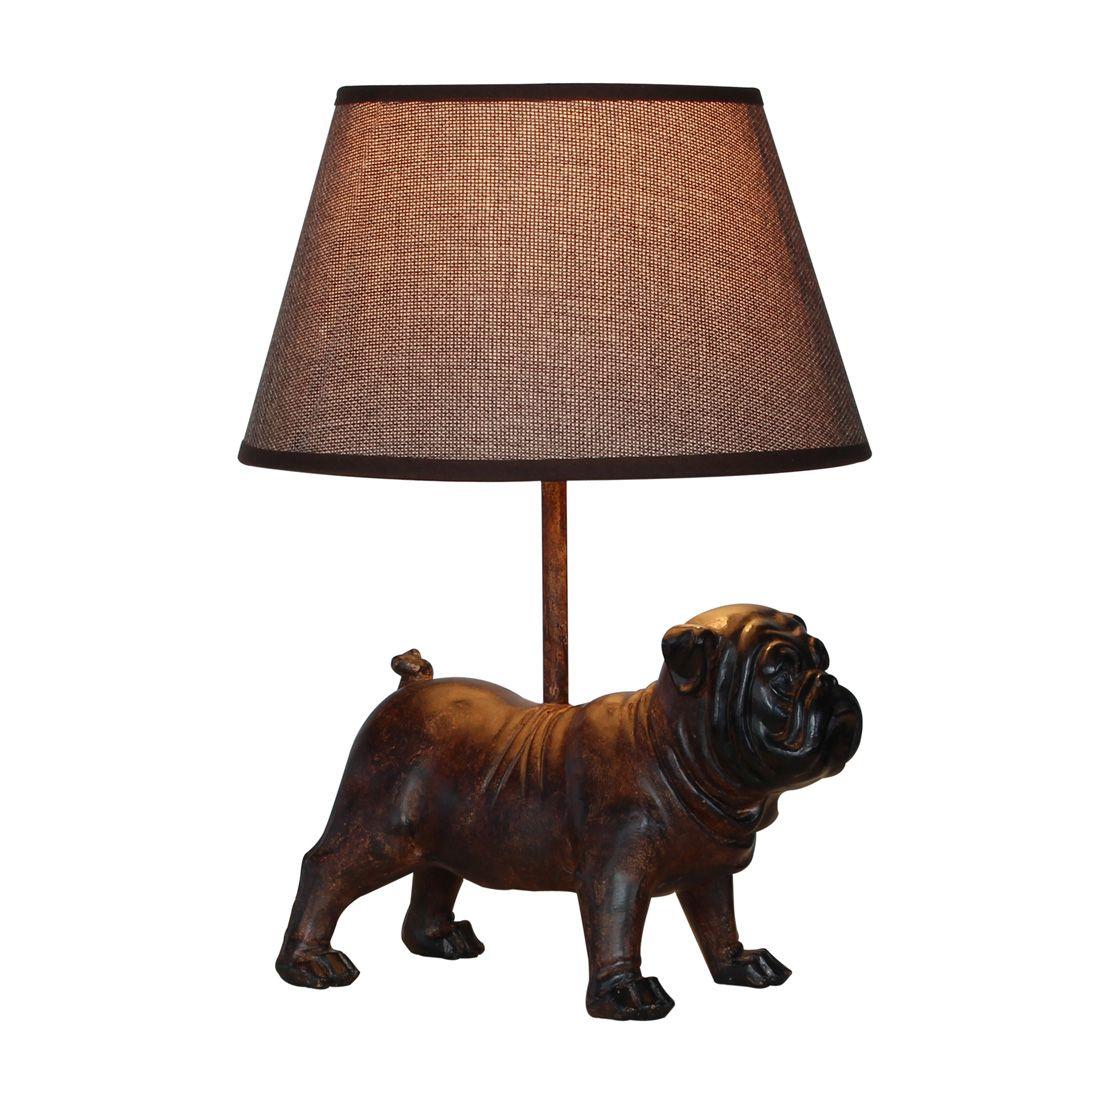 HH Lampe Bulldog Liten m/skjerm, Brun